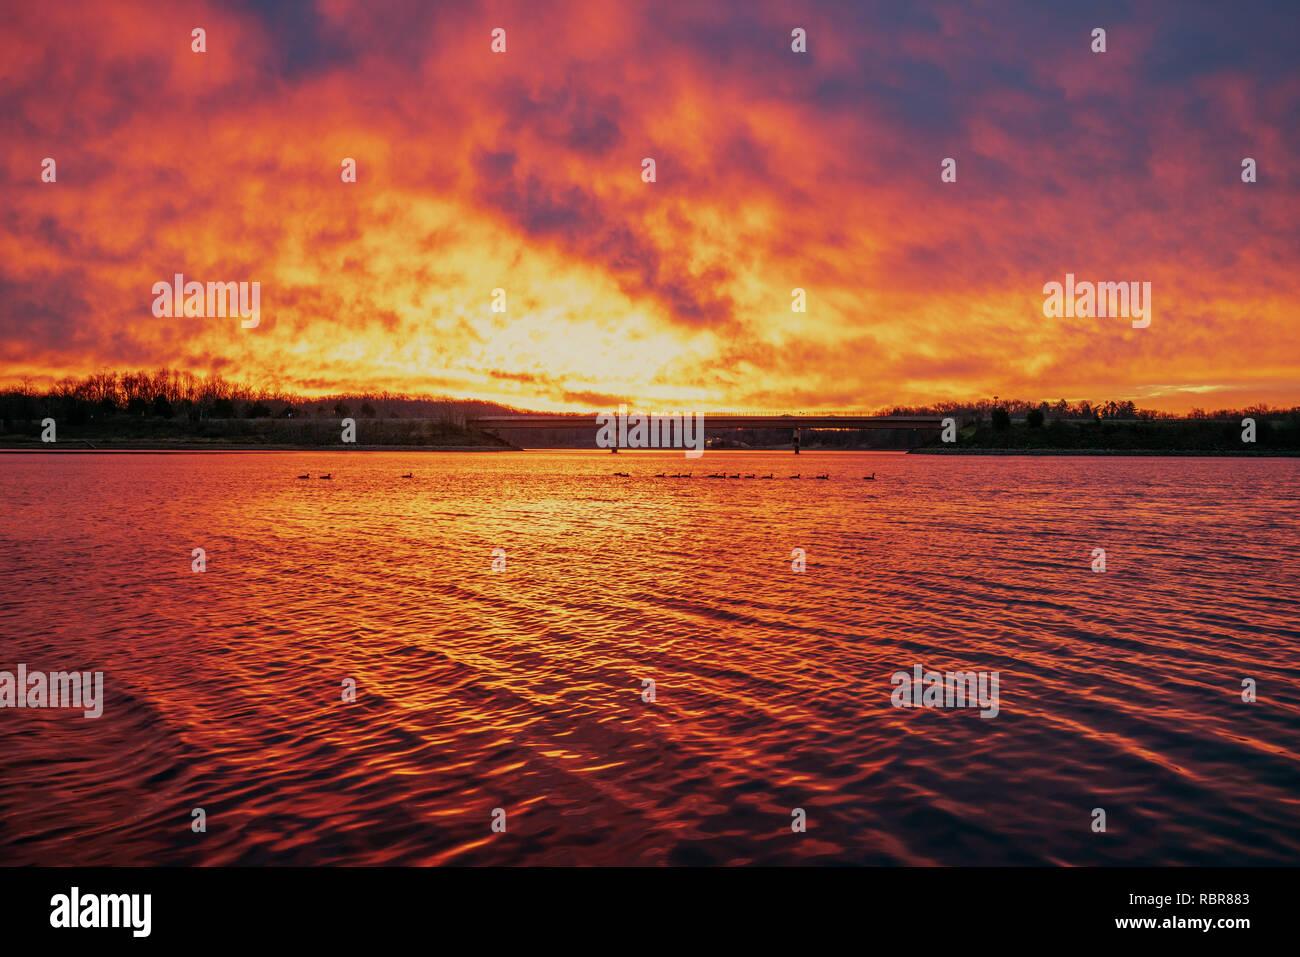 Brilliant dawn light reflects on the surface of Little Seneca Lake. Stock Photo